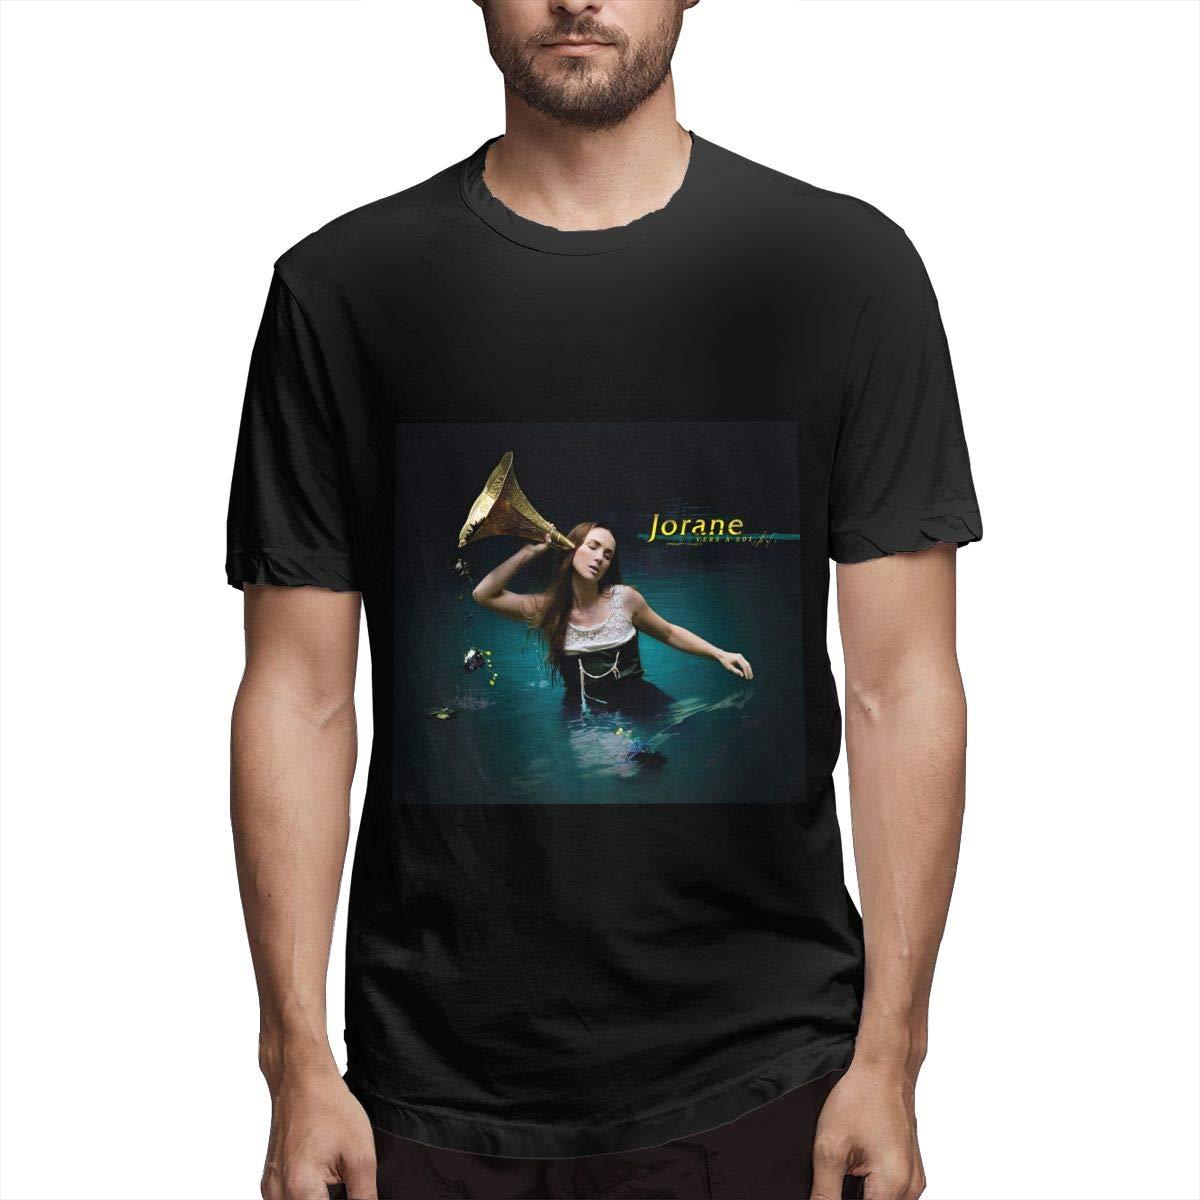 Lihehen Mans Jorane Retro Printing Round Neck Tees Shirts